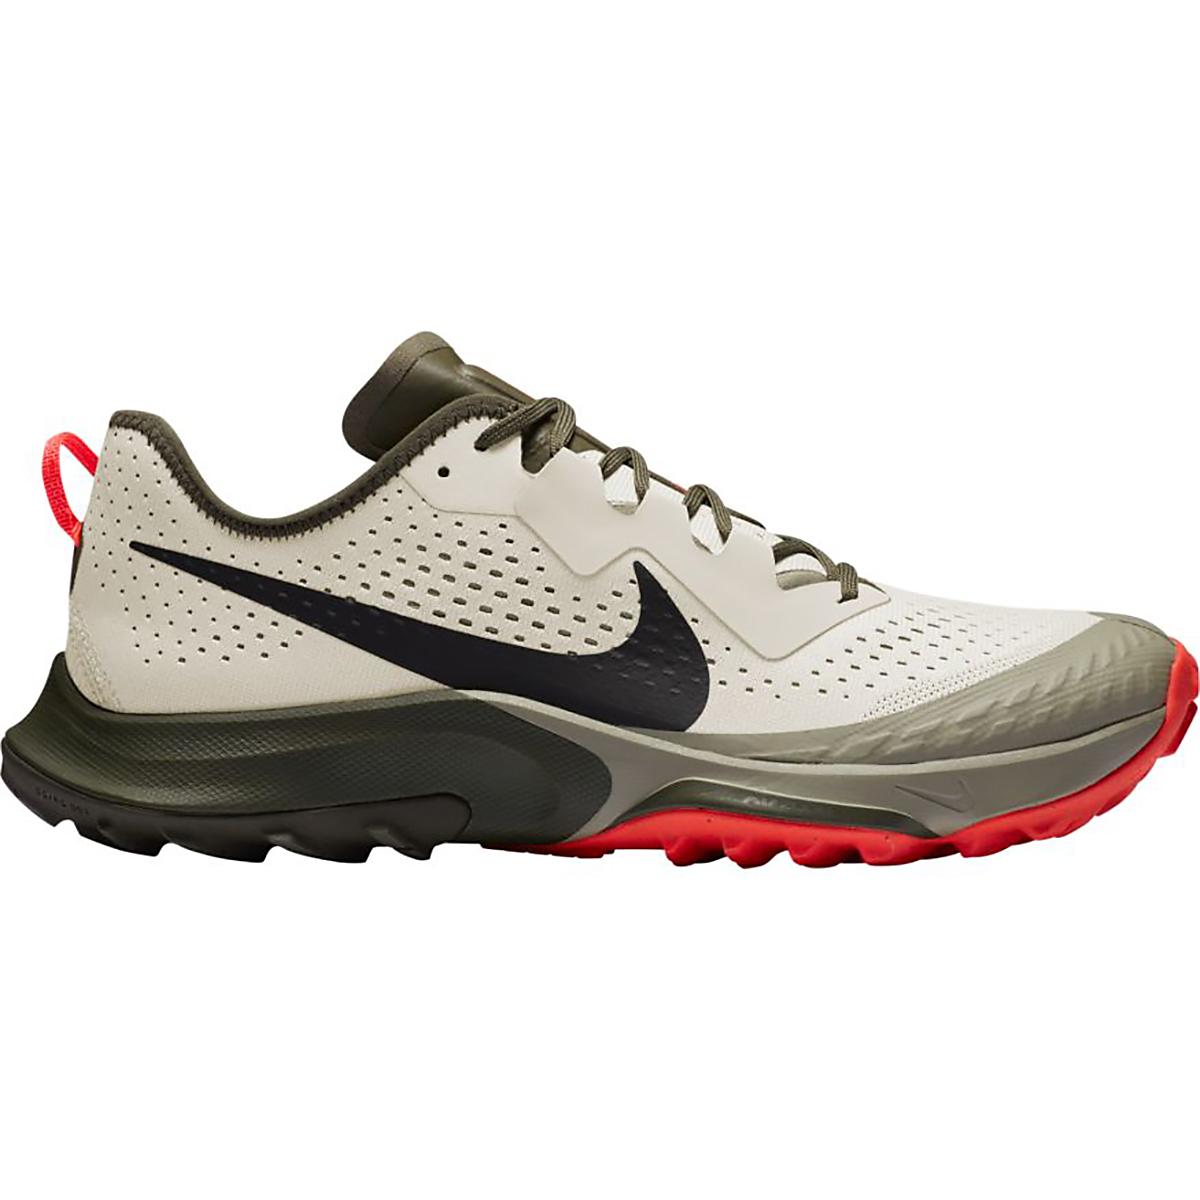 Men's Nike Air Zoom Terra Kiger 7 Trail Running Shoe - Color: Light Bone/Black-Cargo Khaki-Light Army - Size: 6 - Width: Regular, Light Bone/Black-Cargo Khaki-Light Army, large, image 1